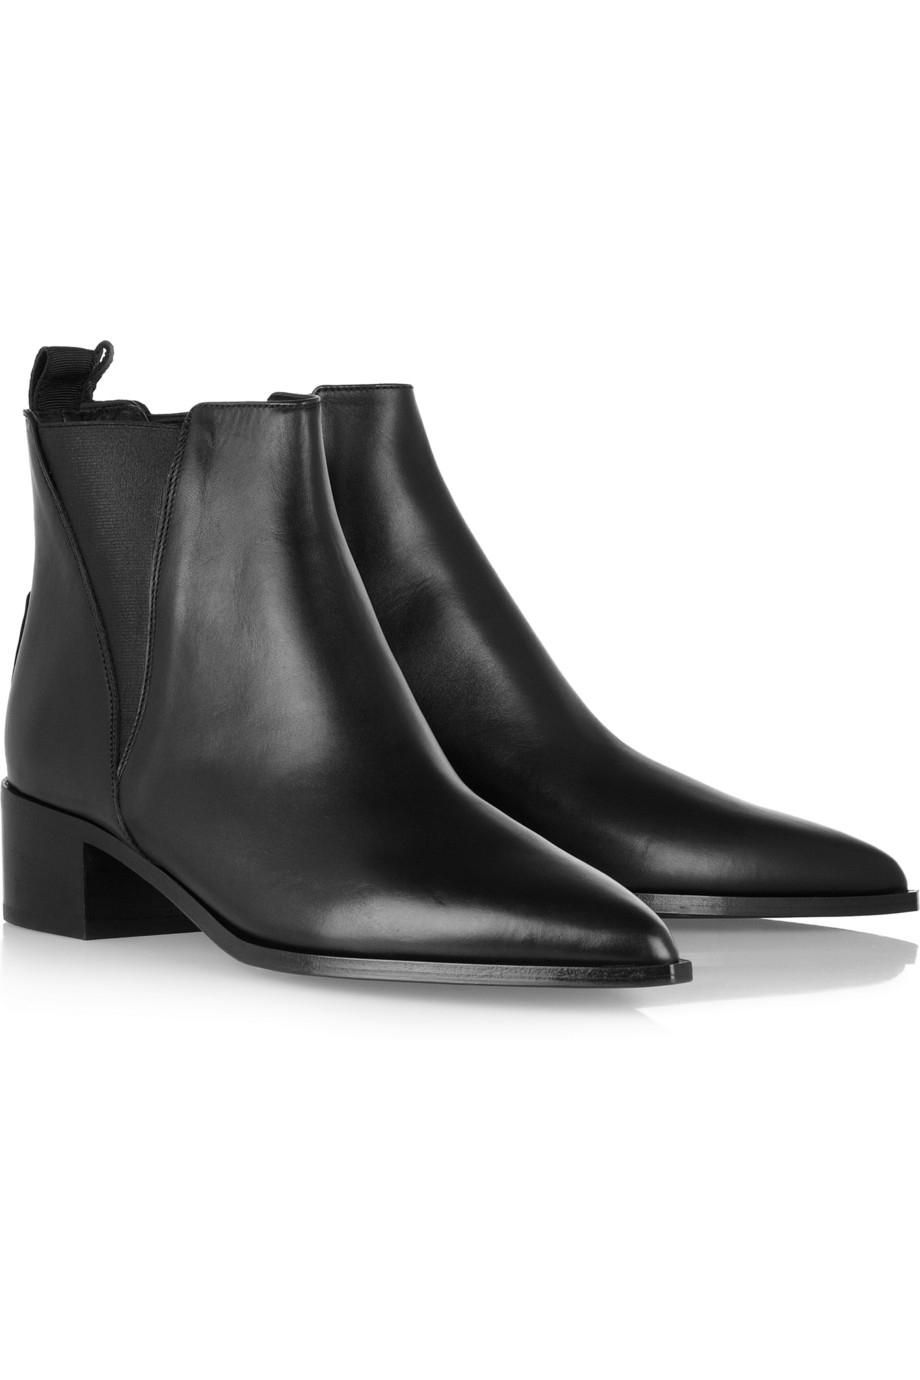 acne studios jensen leather ankle boots in black lyst. Black Bedroom Furniture Sets. Home Design Ideas